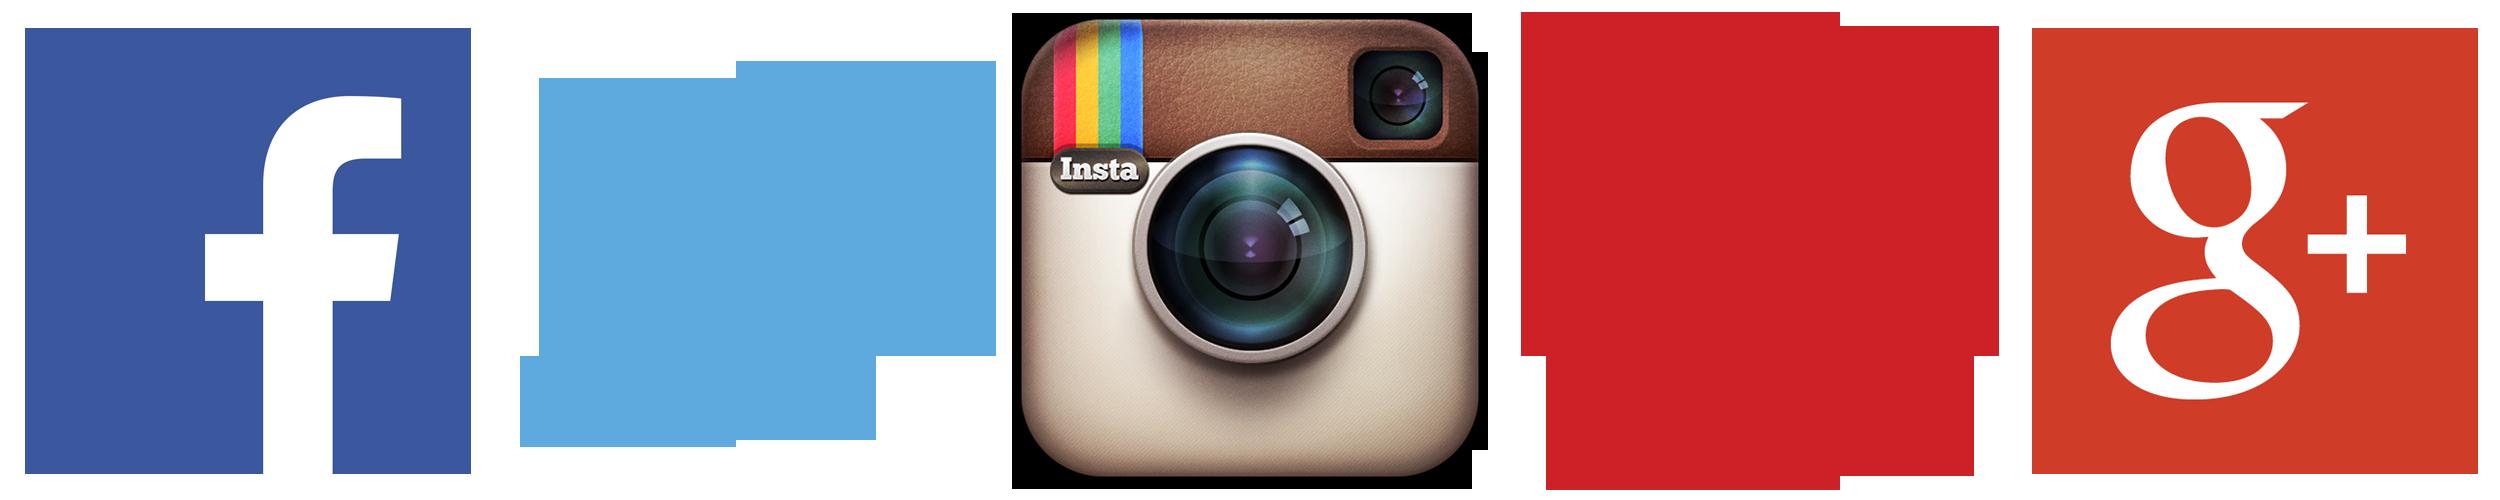 Facebook instagram twitter png. Logo logos clip royalty